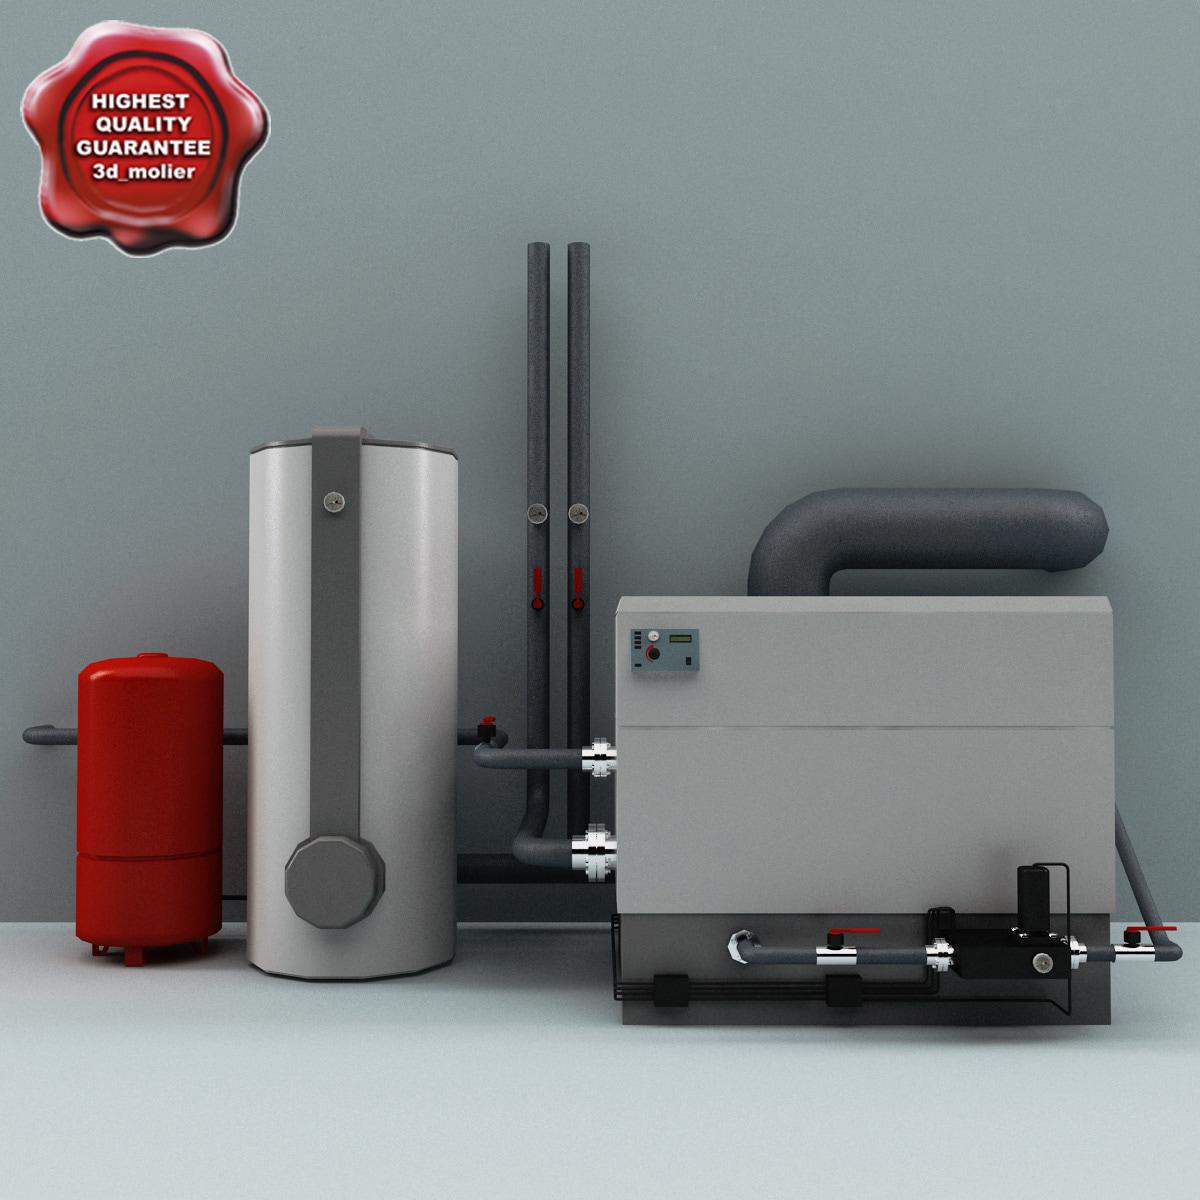 Home_Heating_System_V2_00.jpg